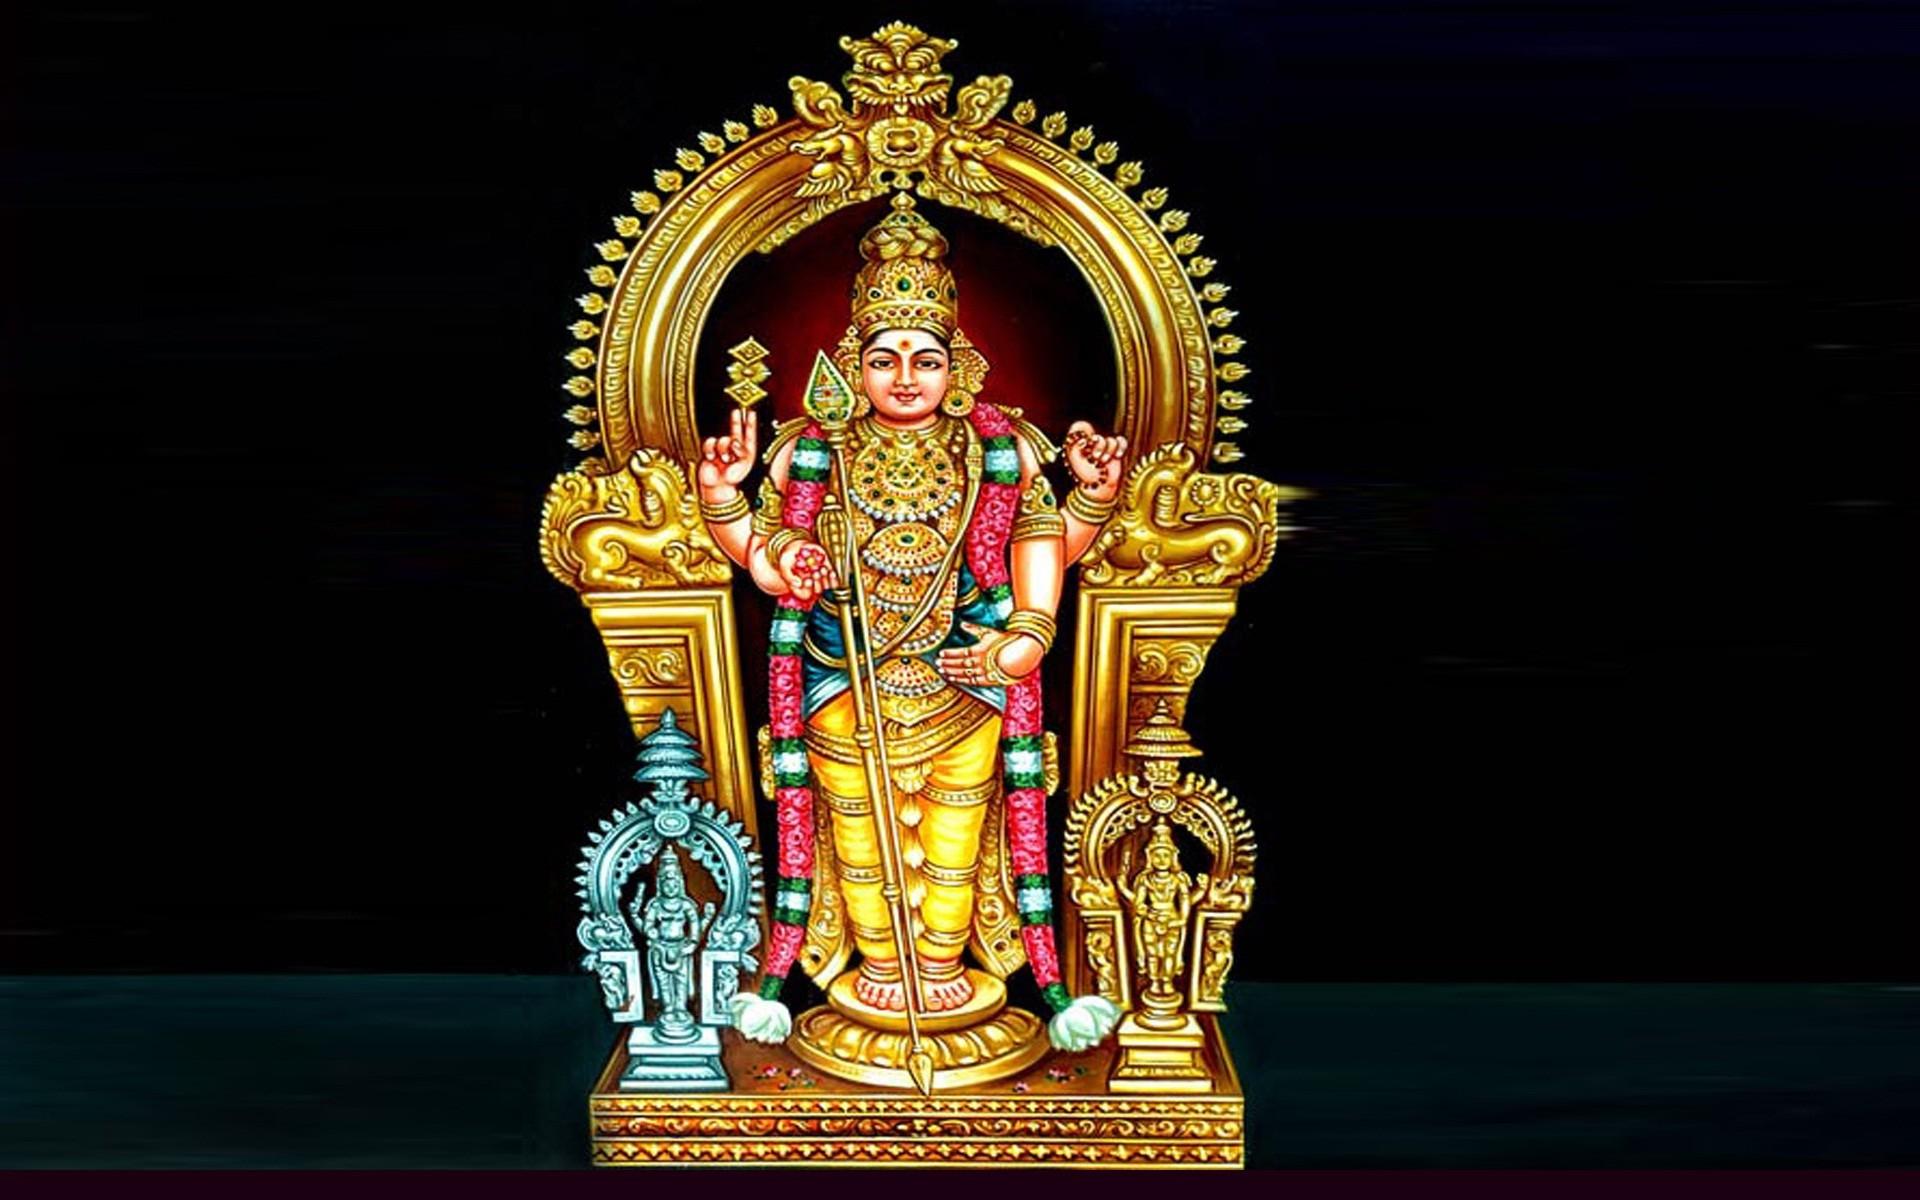 God Ganesh Hd 3d Wallpaper Hindu God Hd Wallpapers 1080p 68 Images